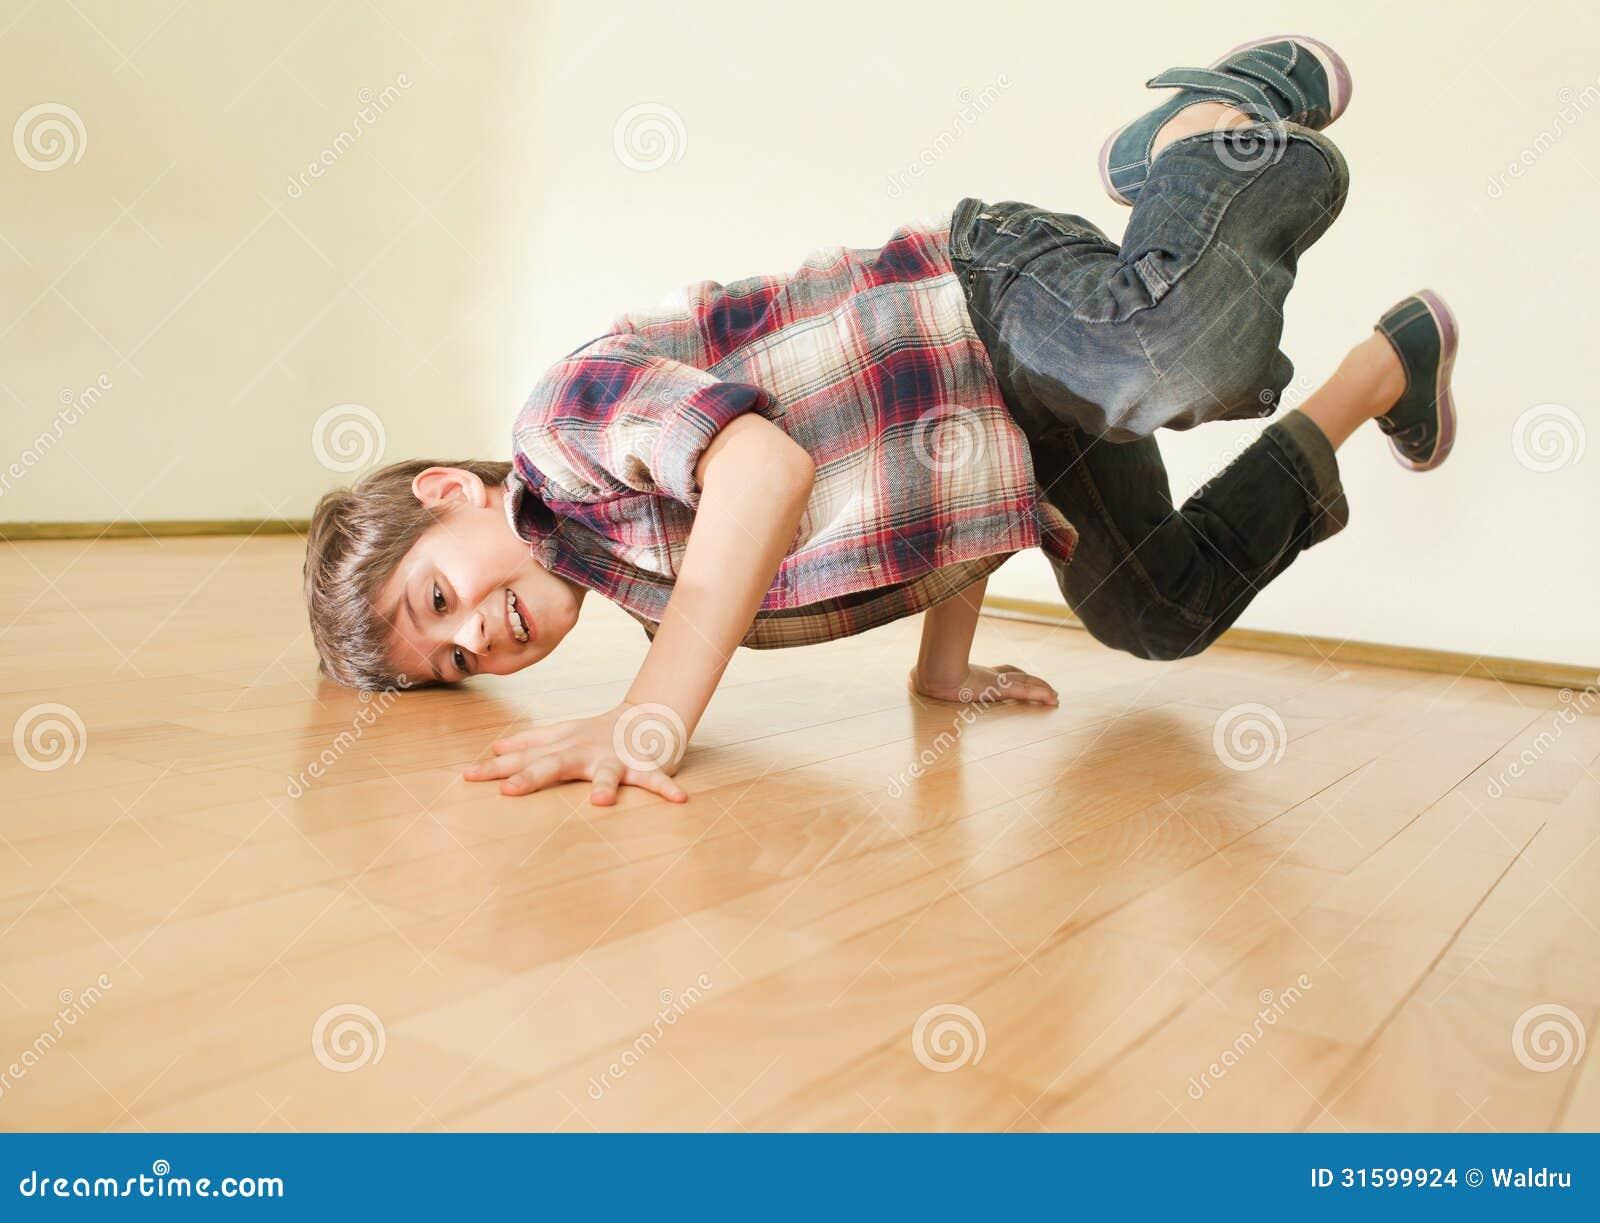 Breakdancer Stock Images - Image: 31599924